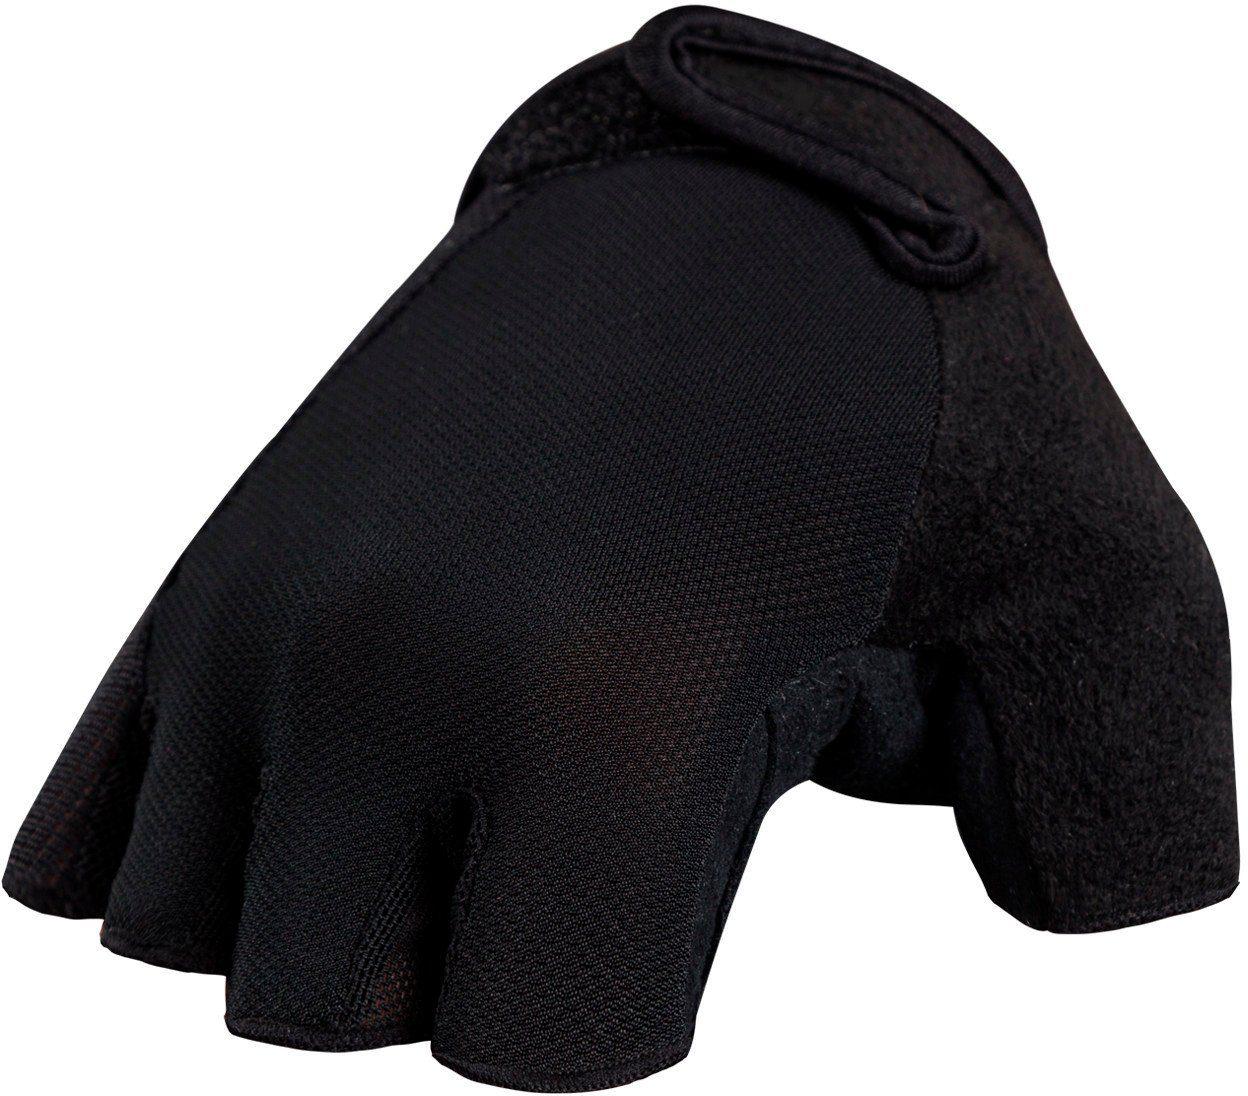 Sugoi Fahrrad Handschuhe »Sugoi Performance Gloves Men«